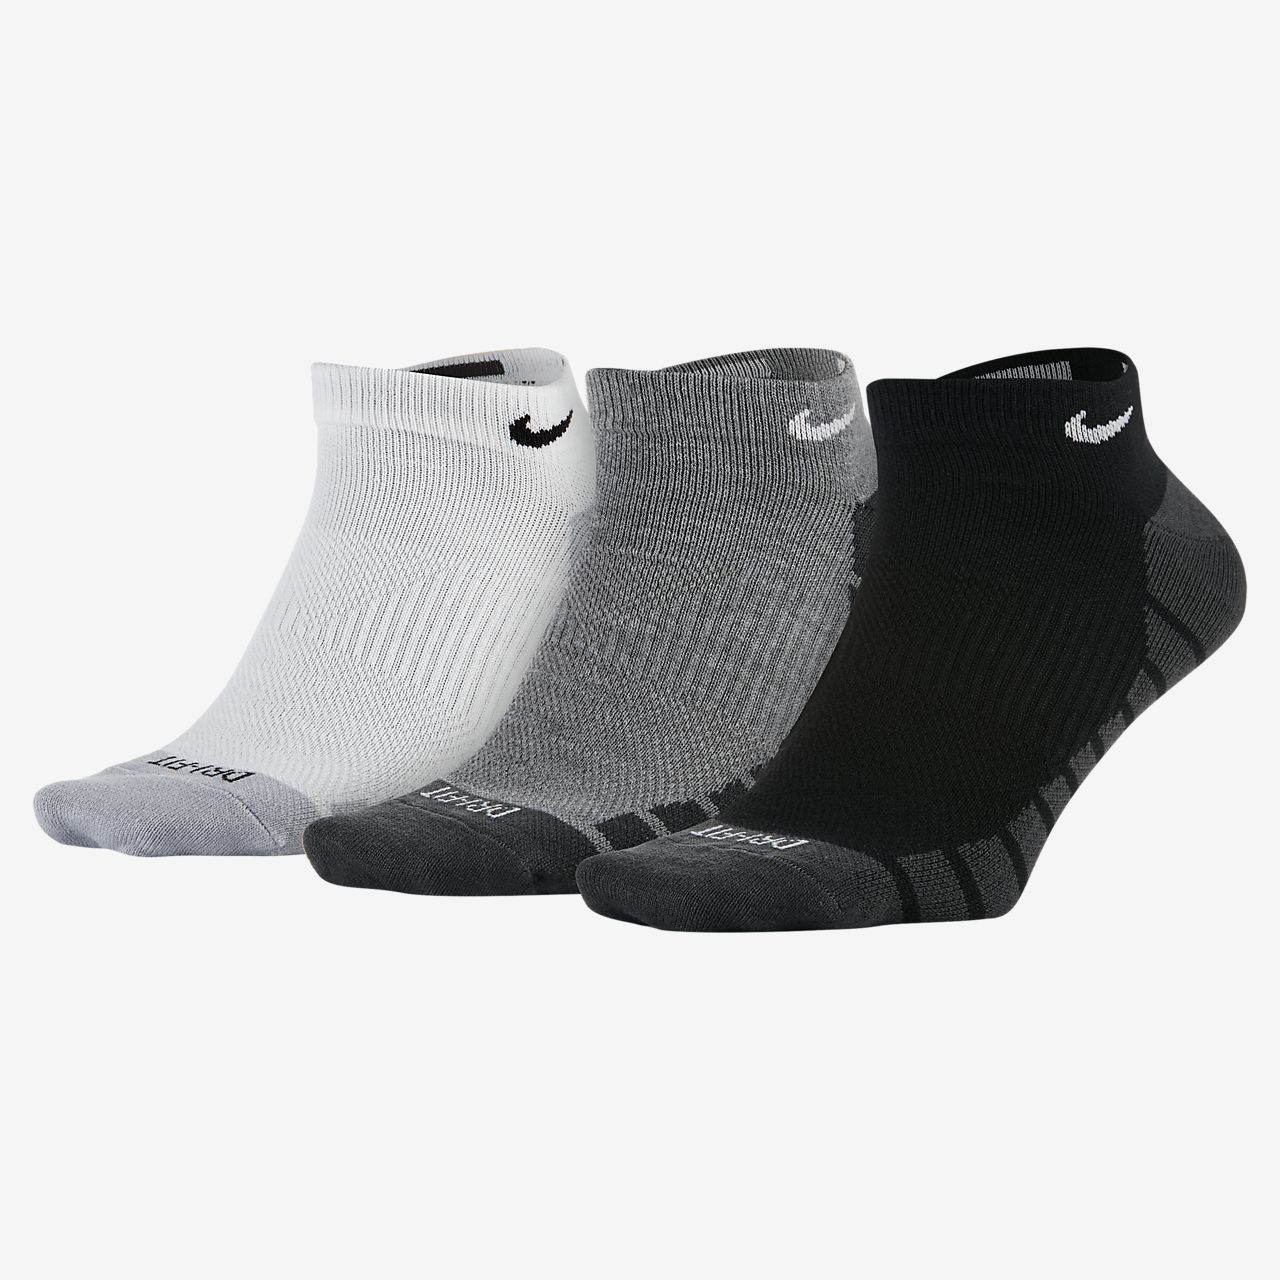 Nike Dry Lightweight No-Show treningssokker (3 par)